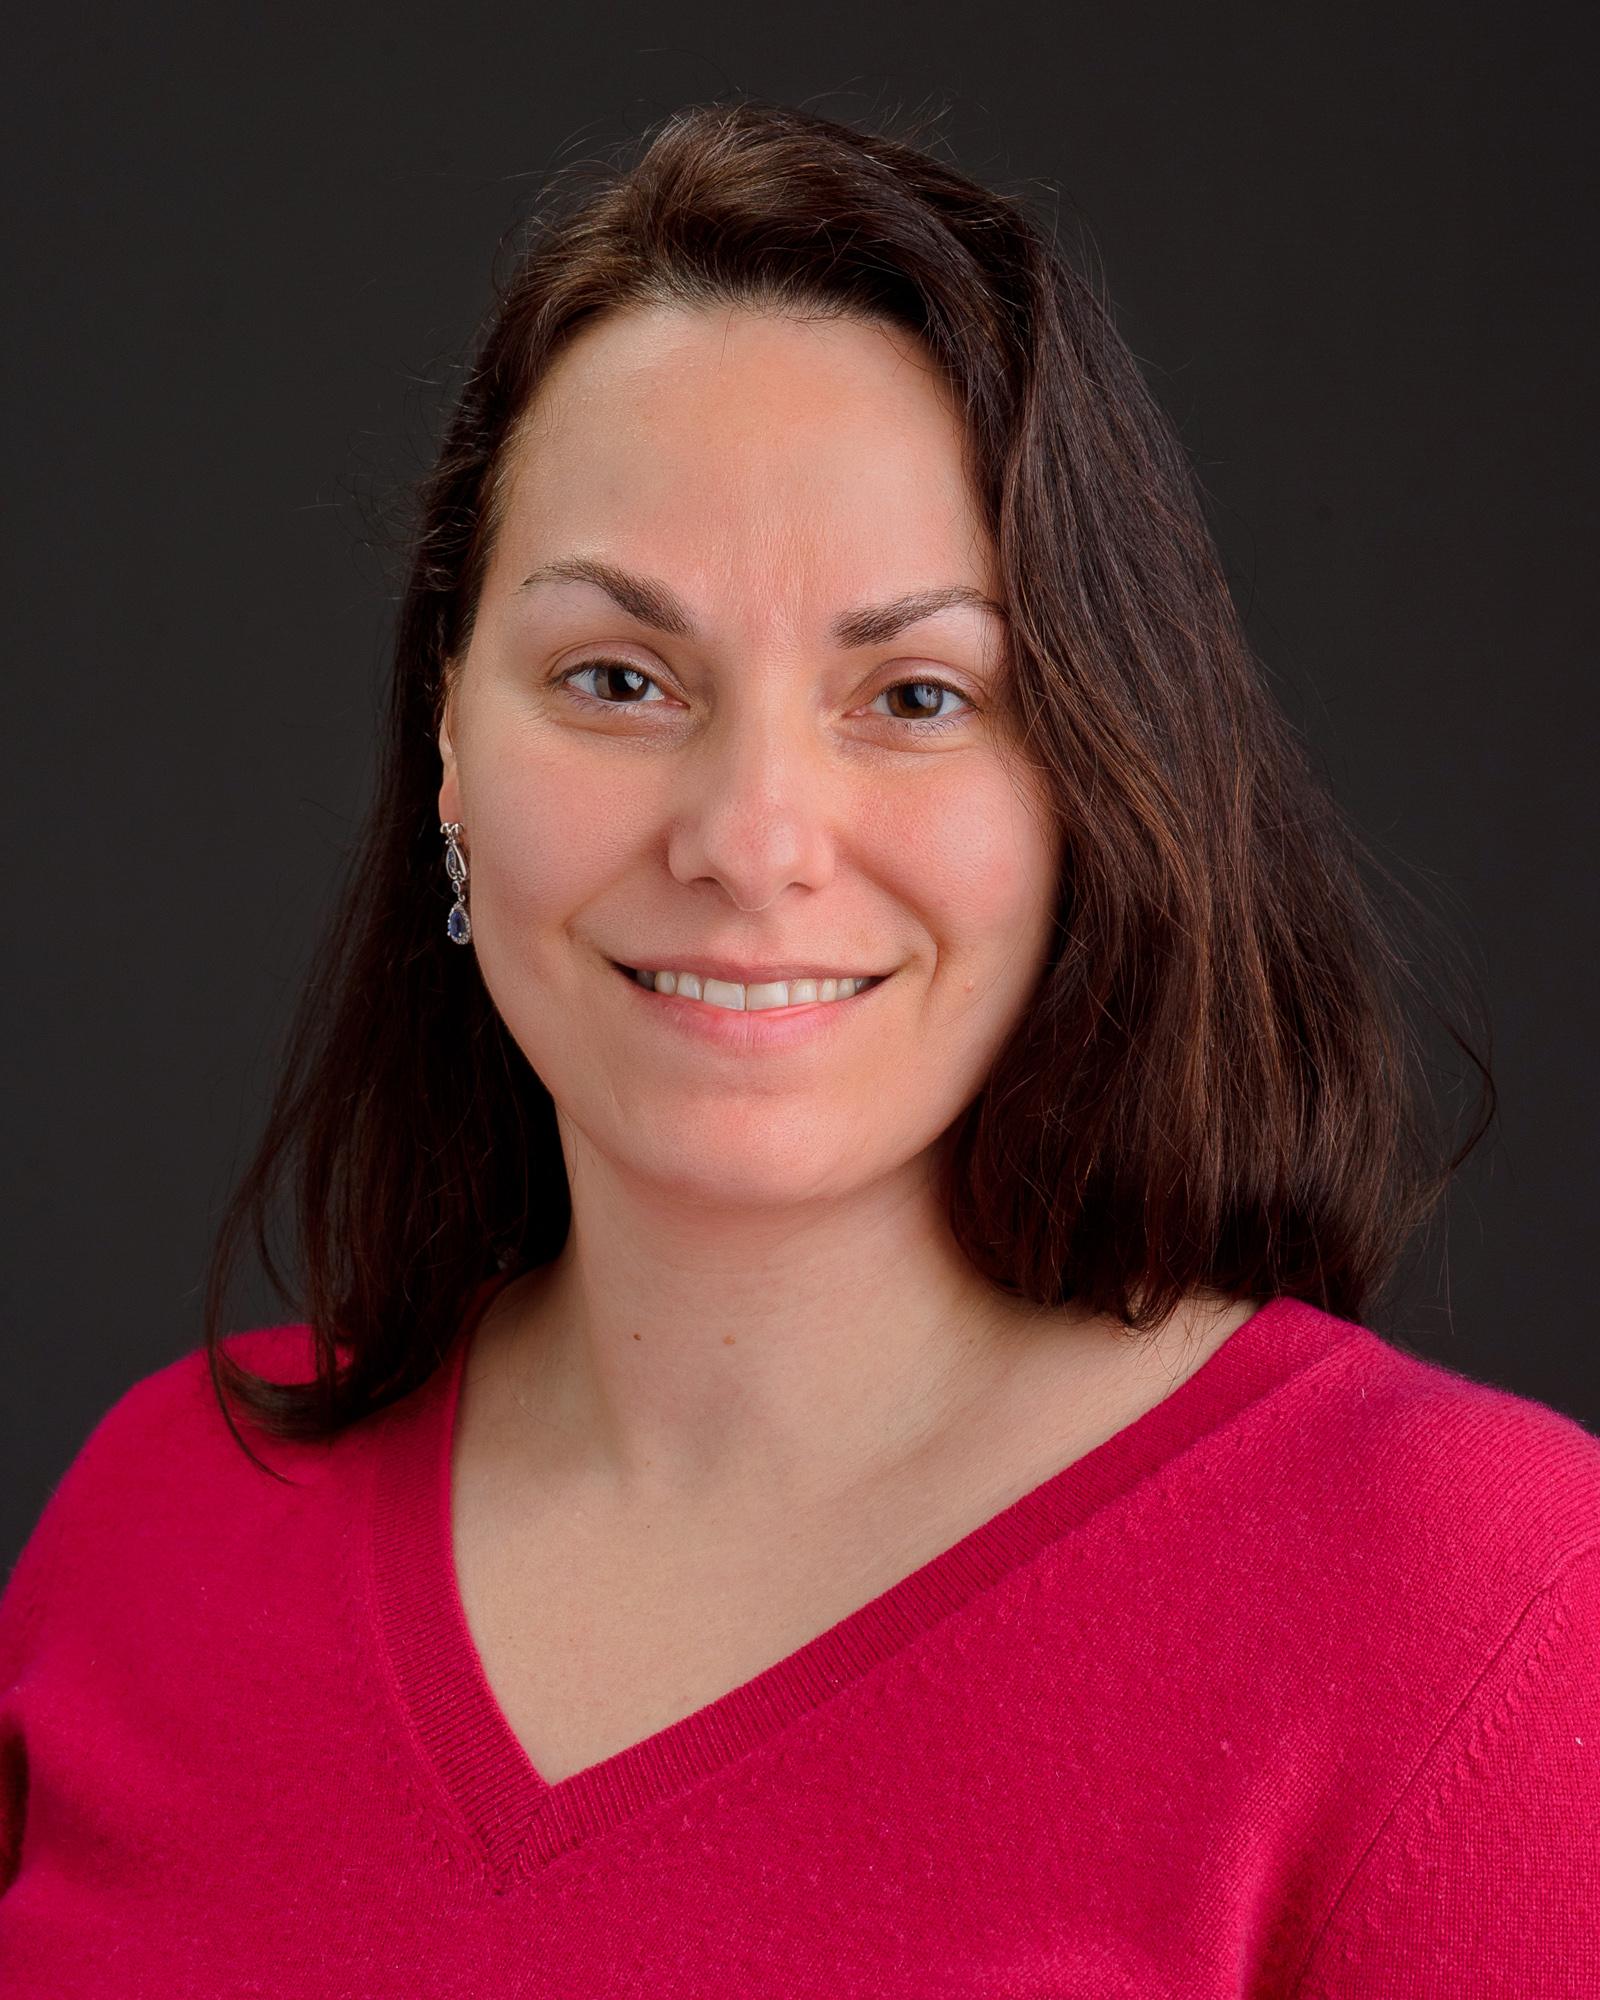 Christine Franzese, MD, otolaryngology, AAOA 2017-2018 President